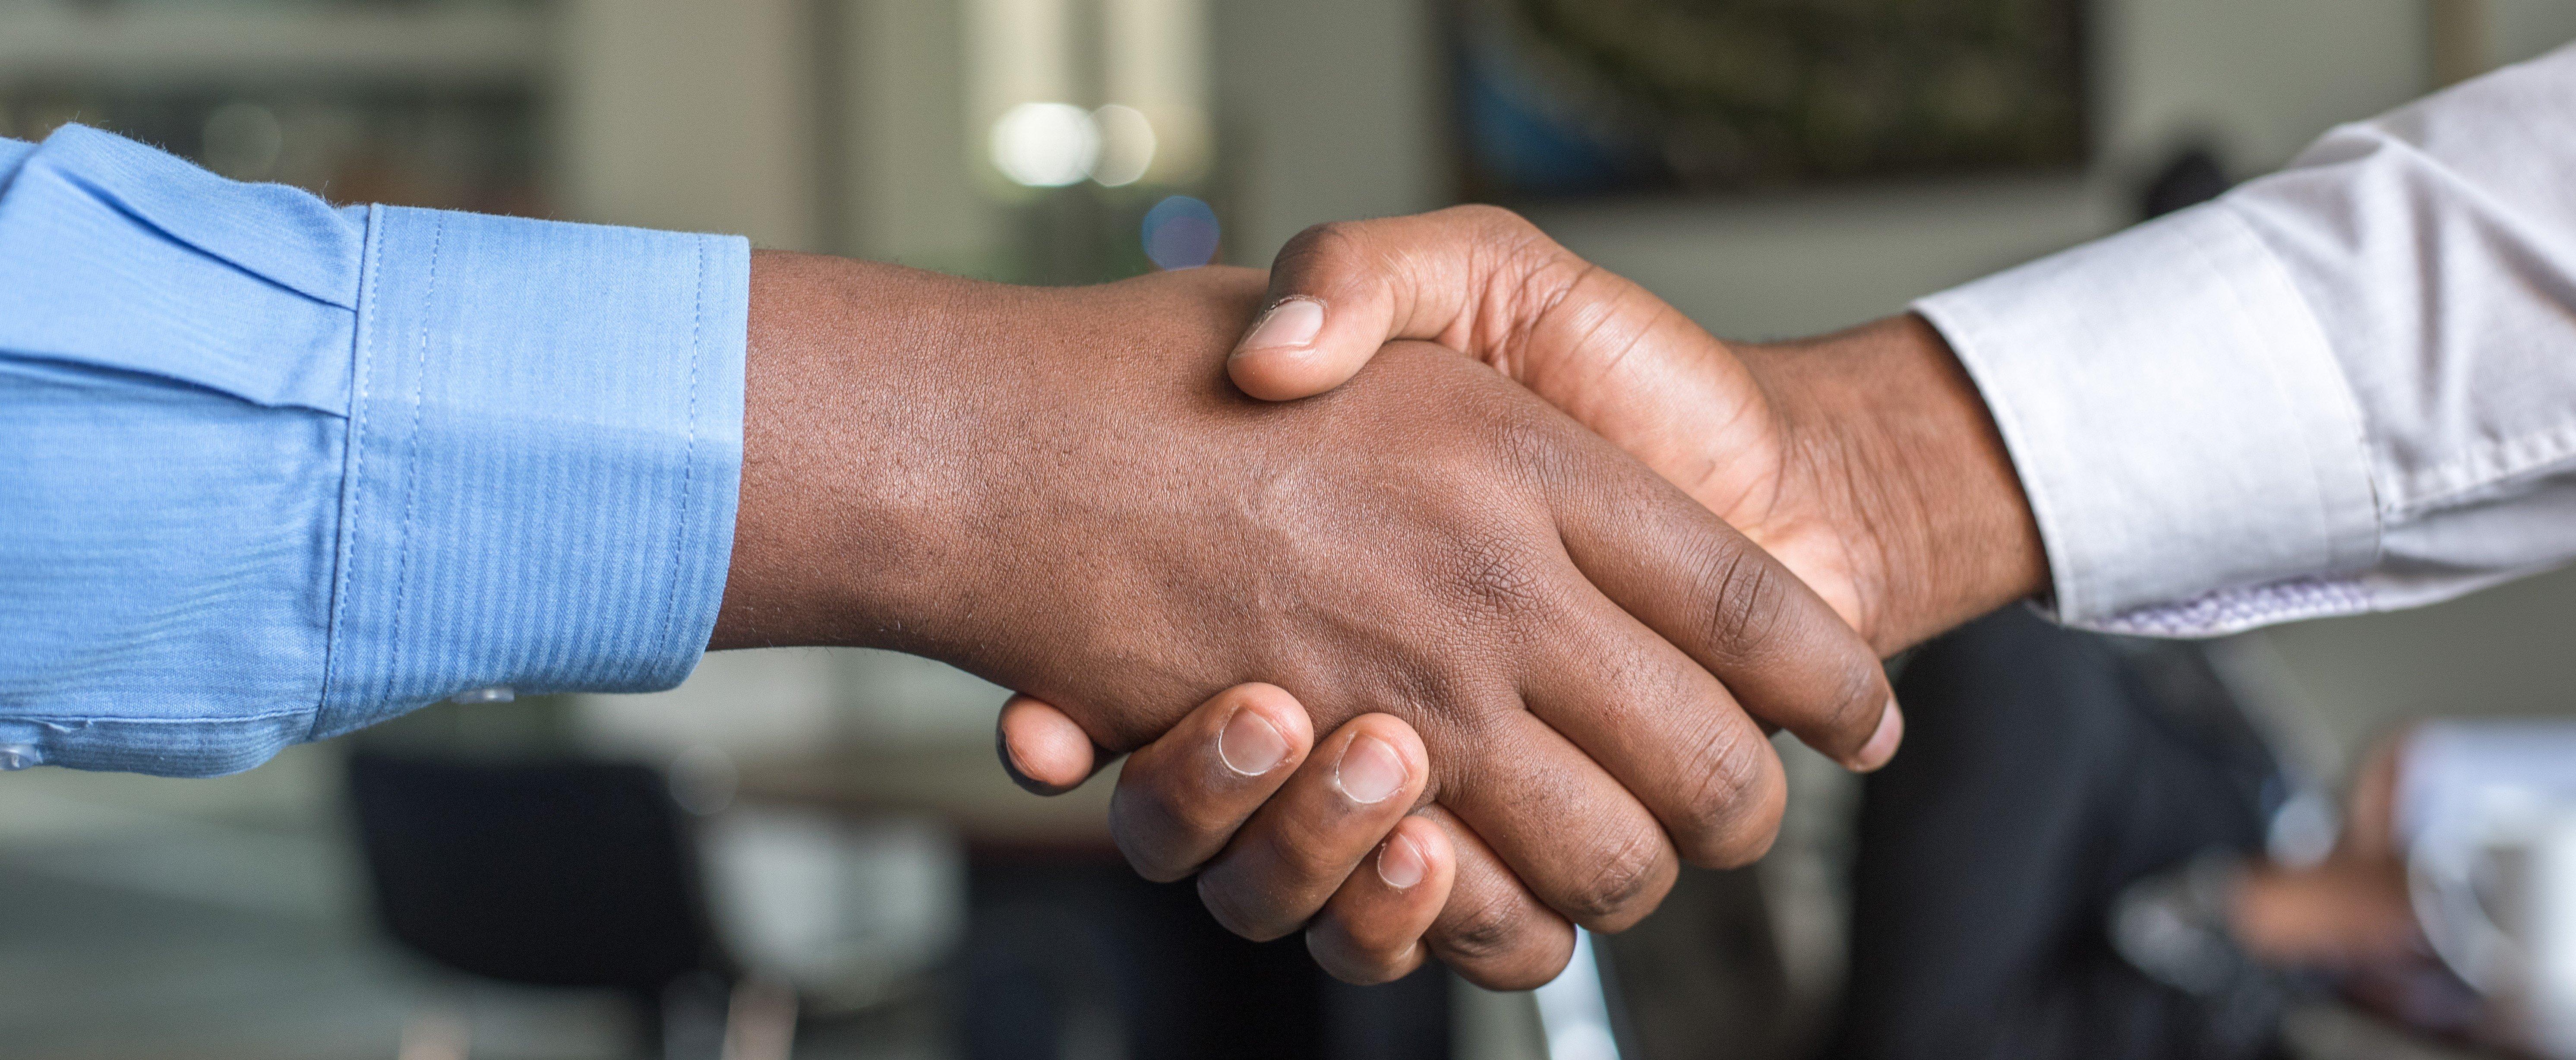 handshake banner - cytonn-photography-604681-unsplash